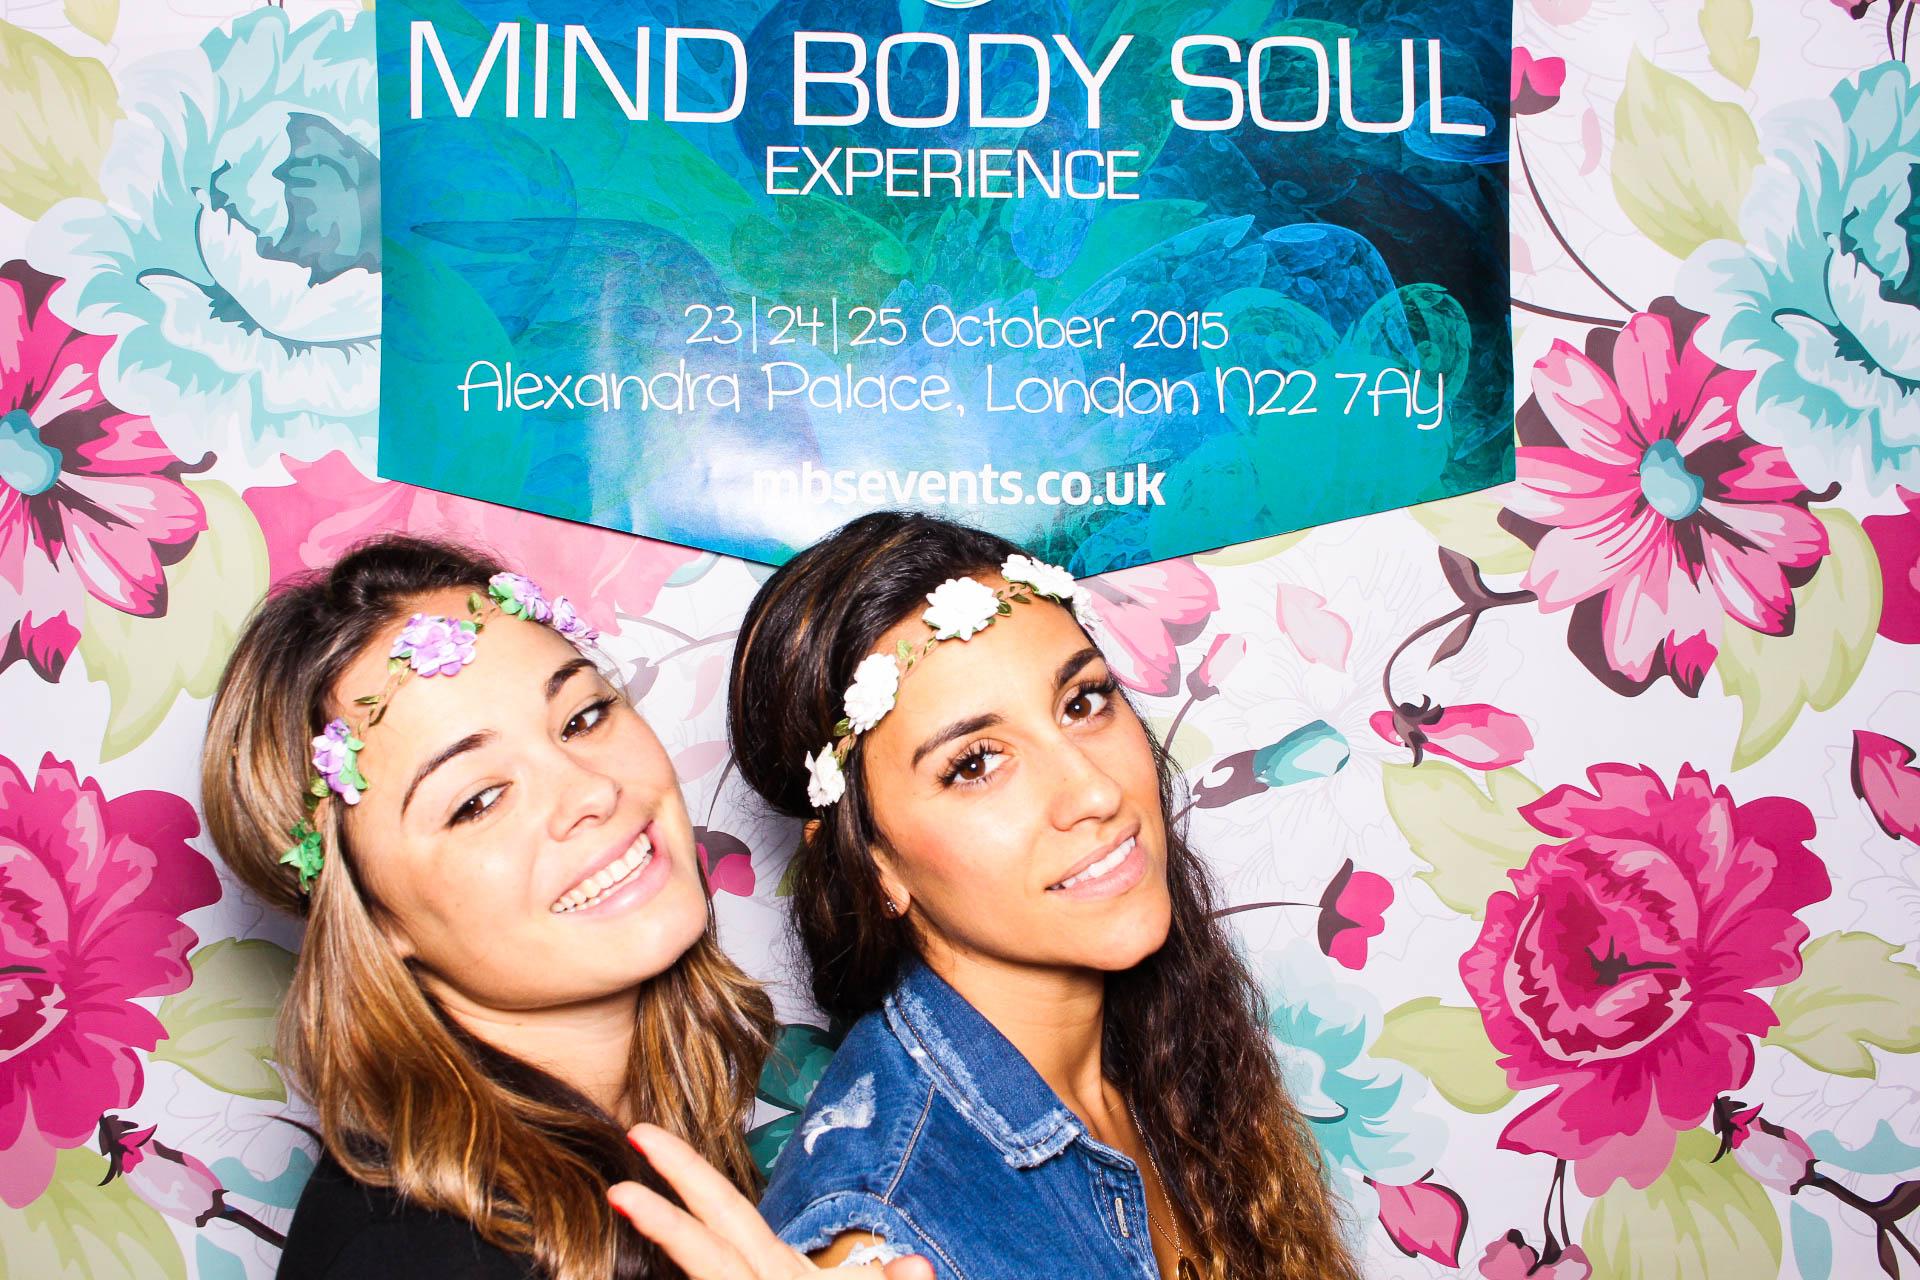 Mind Body Soul Exhibition - 23/10/2015